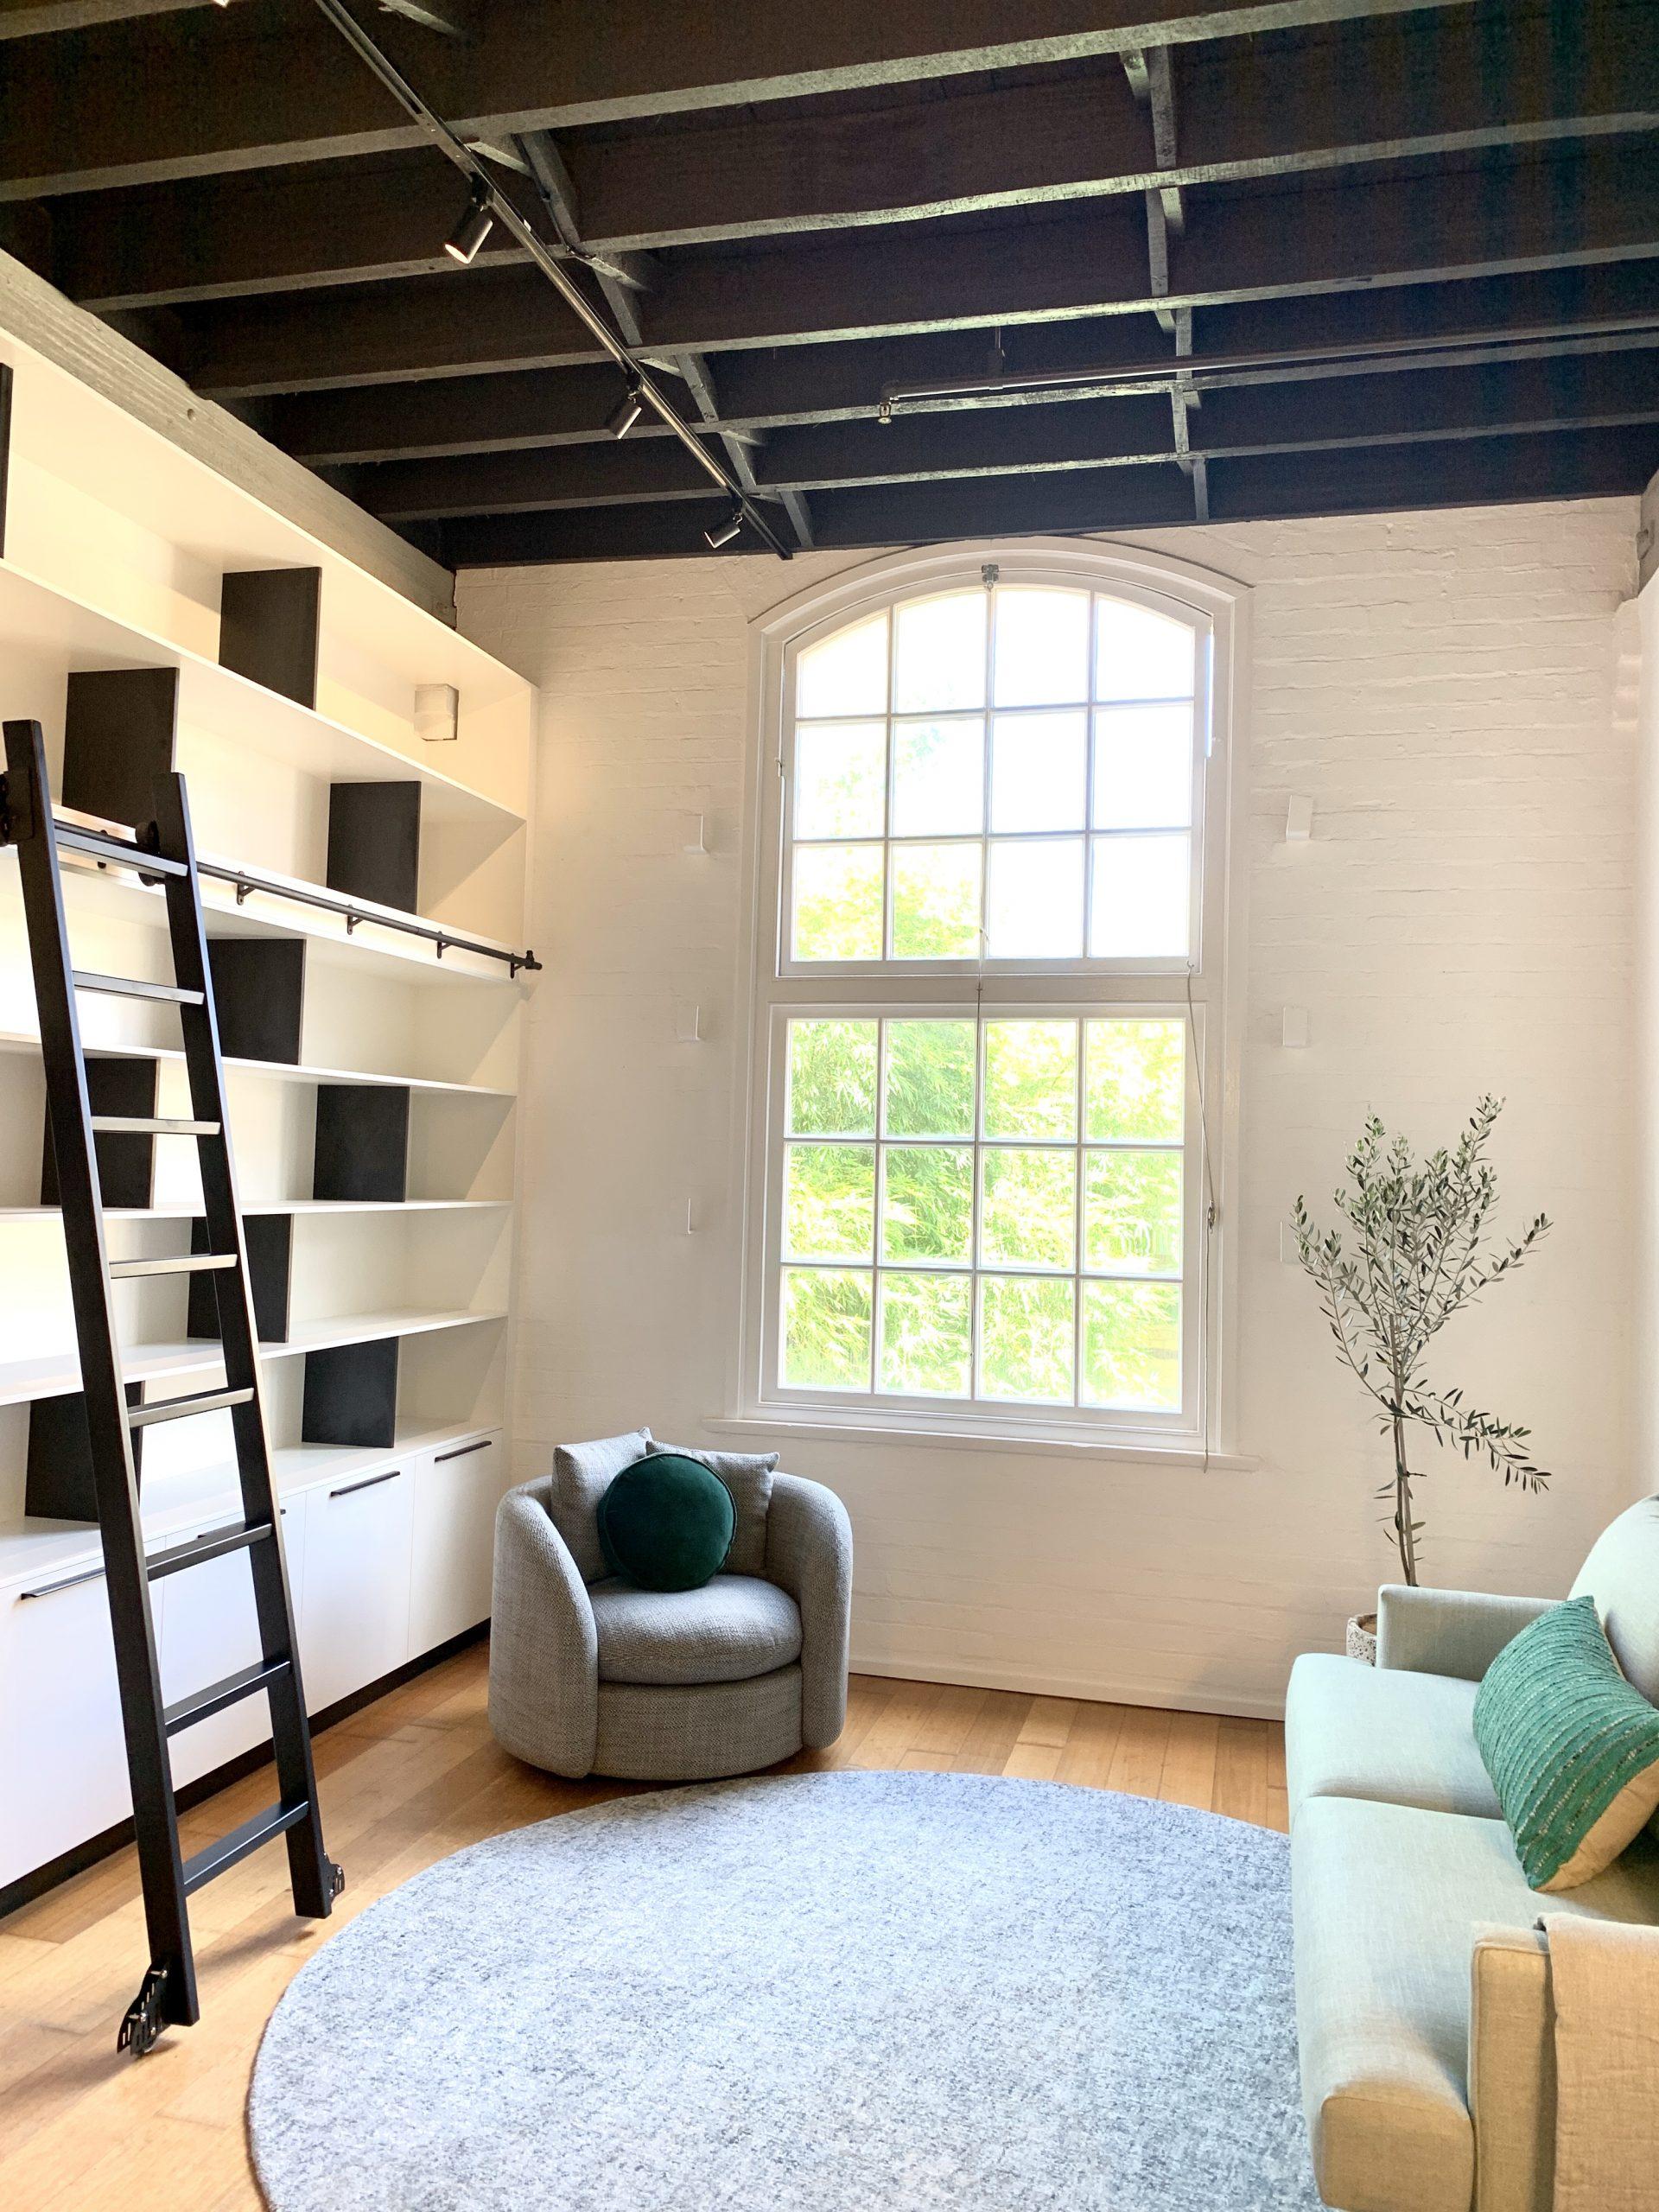 https://www.ivyandfinch.com.au/wp-content/uploads/2021/02/Interior-Design-Teneriffe-Apartment-Renovation-scaled.jpg